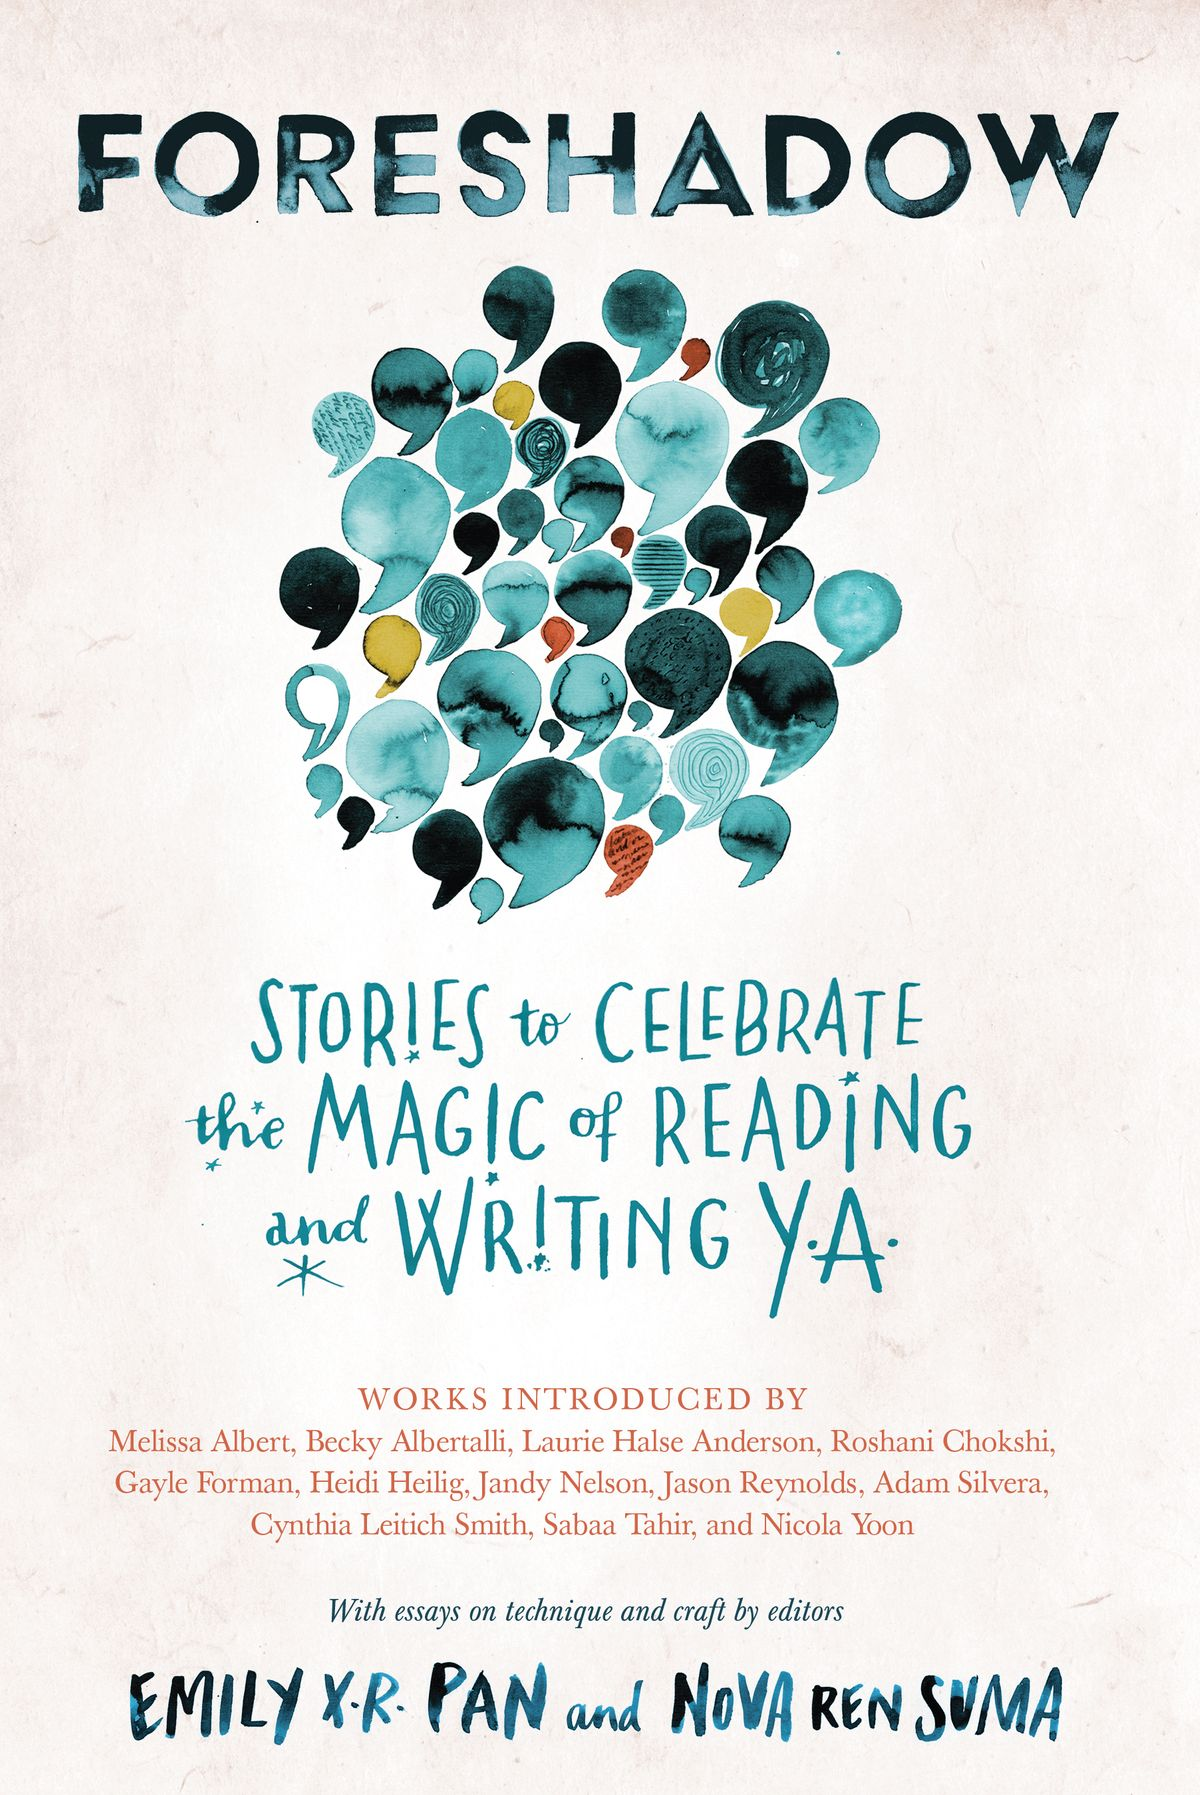 FORESHADOW: Stories to Celebrate The Magic of Reading & Writing YA by Nova Ren Suma, Emily X.R. Pan